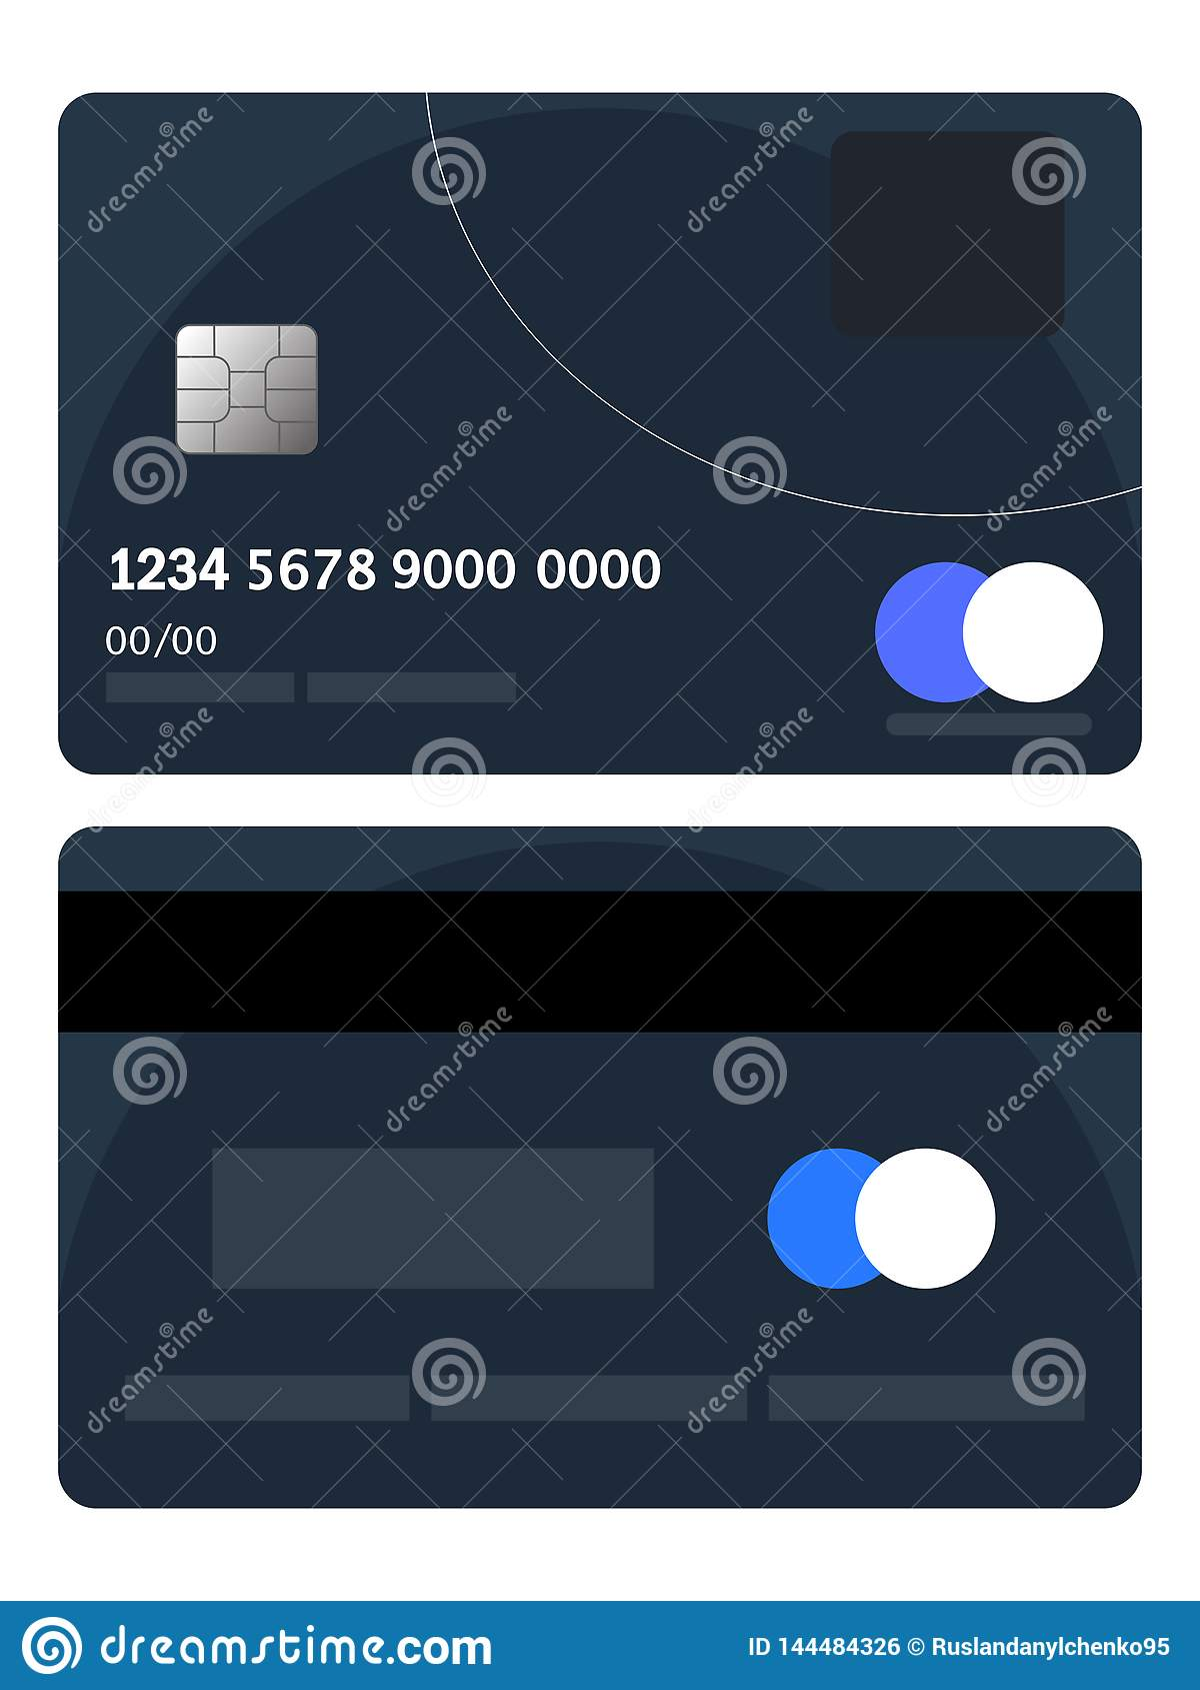 Credit Card For Bad Credit >> Credit Card Badge Vector Bad Credit Card Badge Flat Design